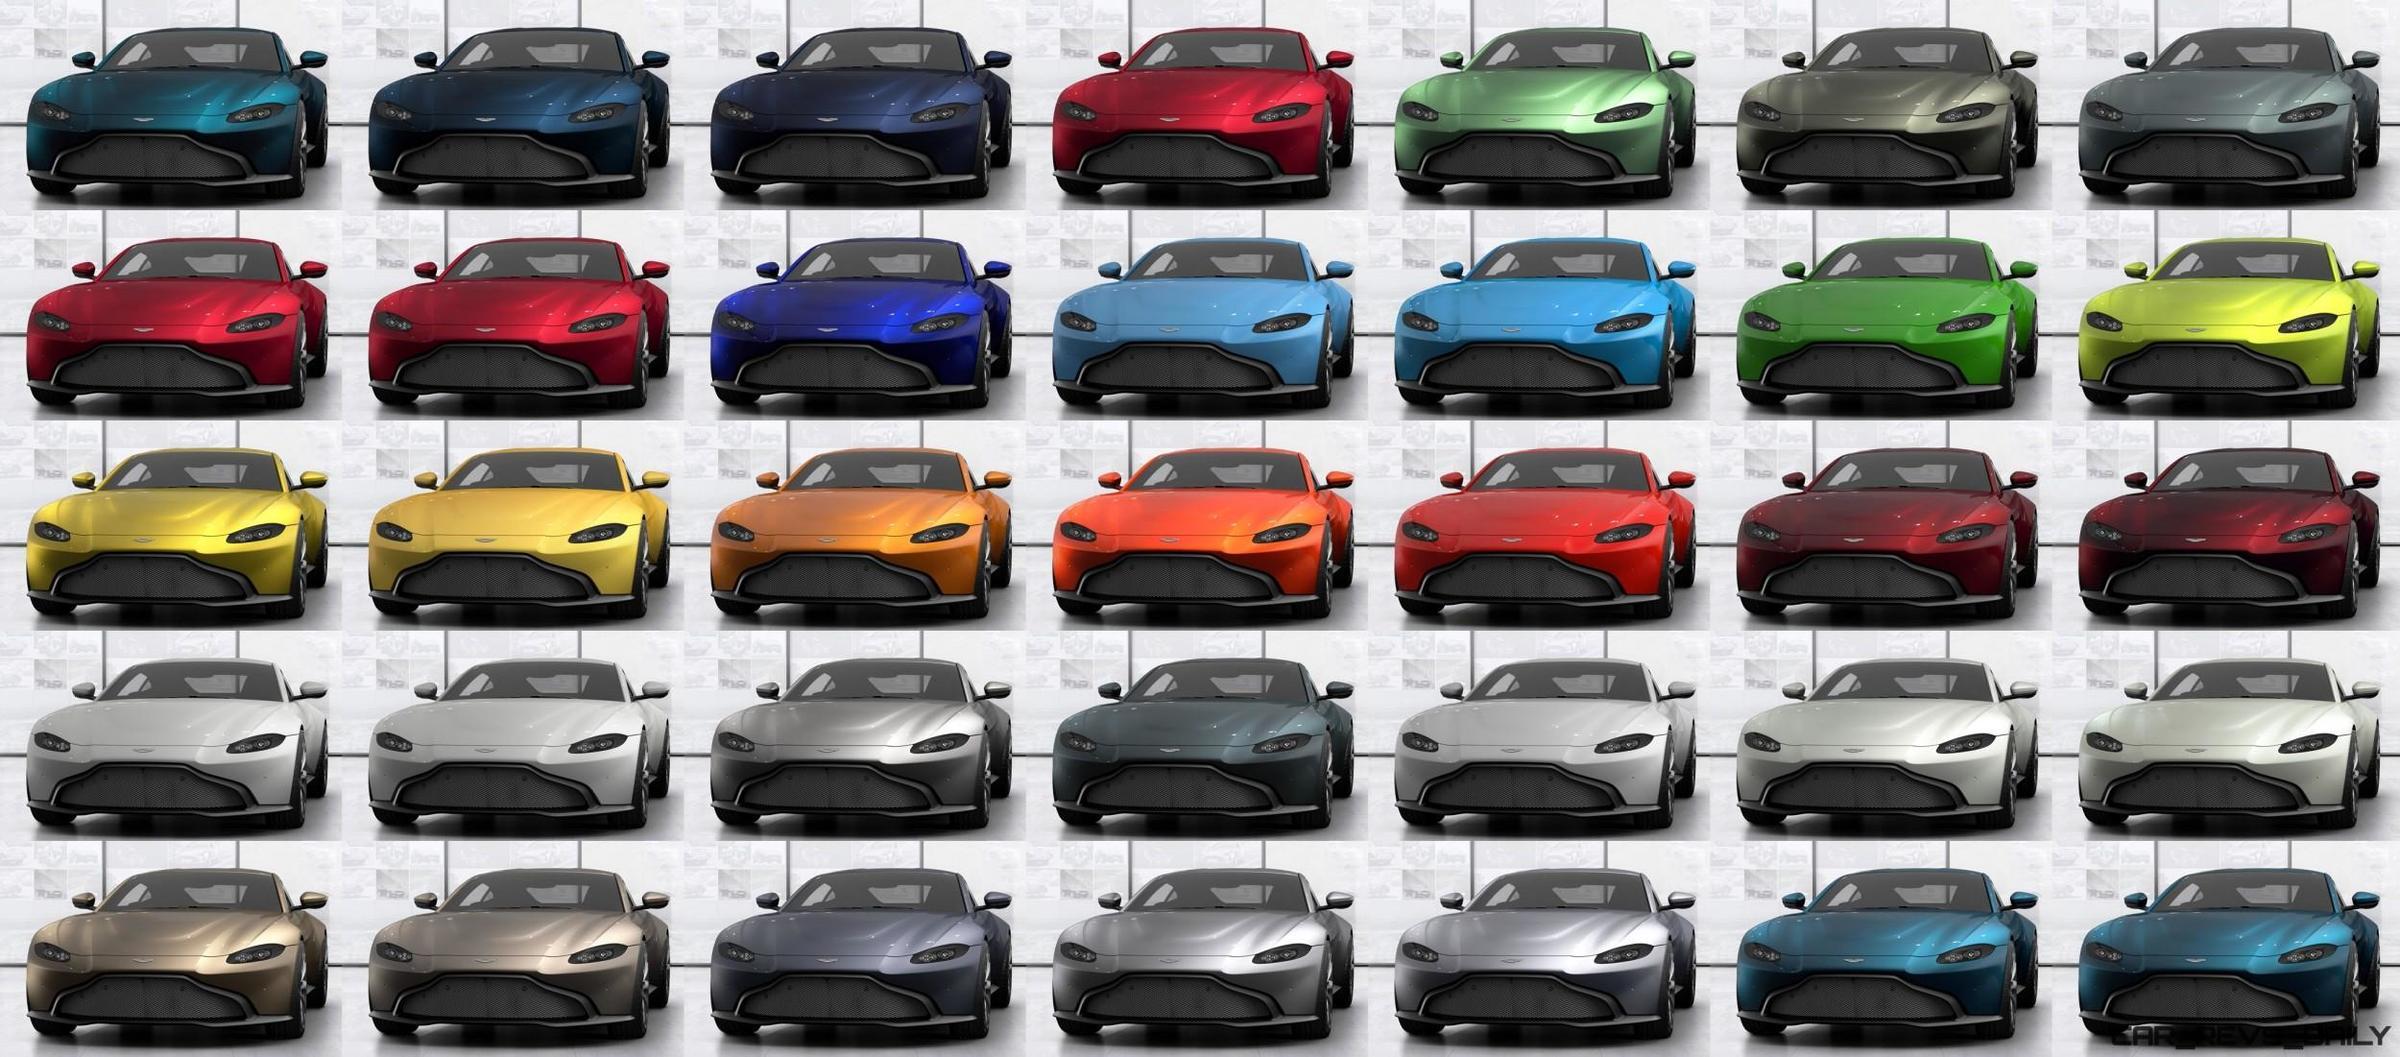 2018 Aston Martin Vantage All Colors 13 Tile